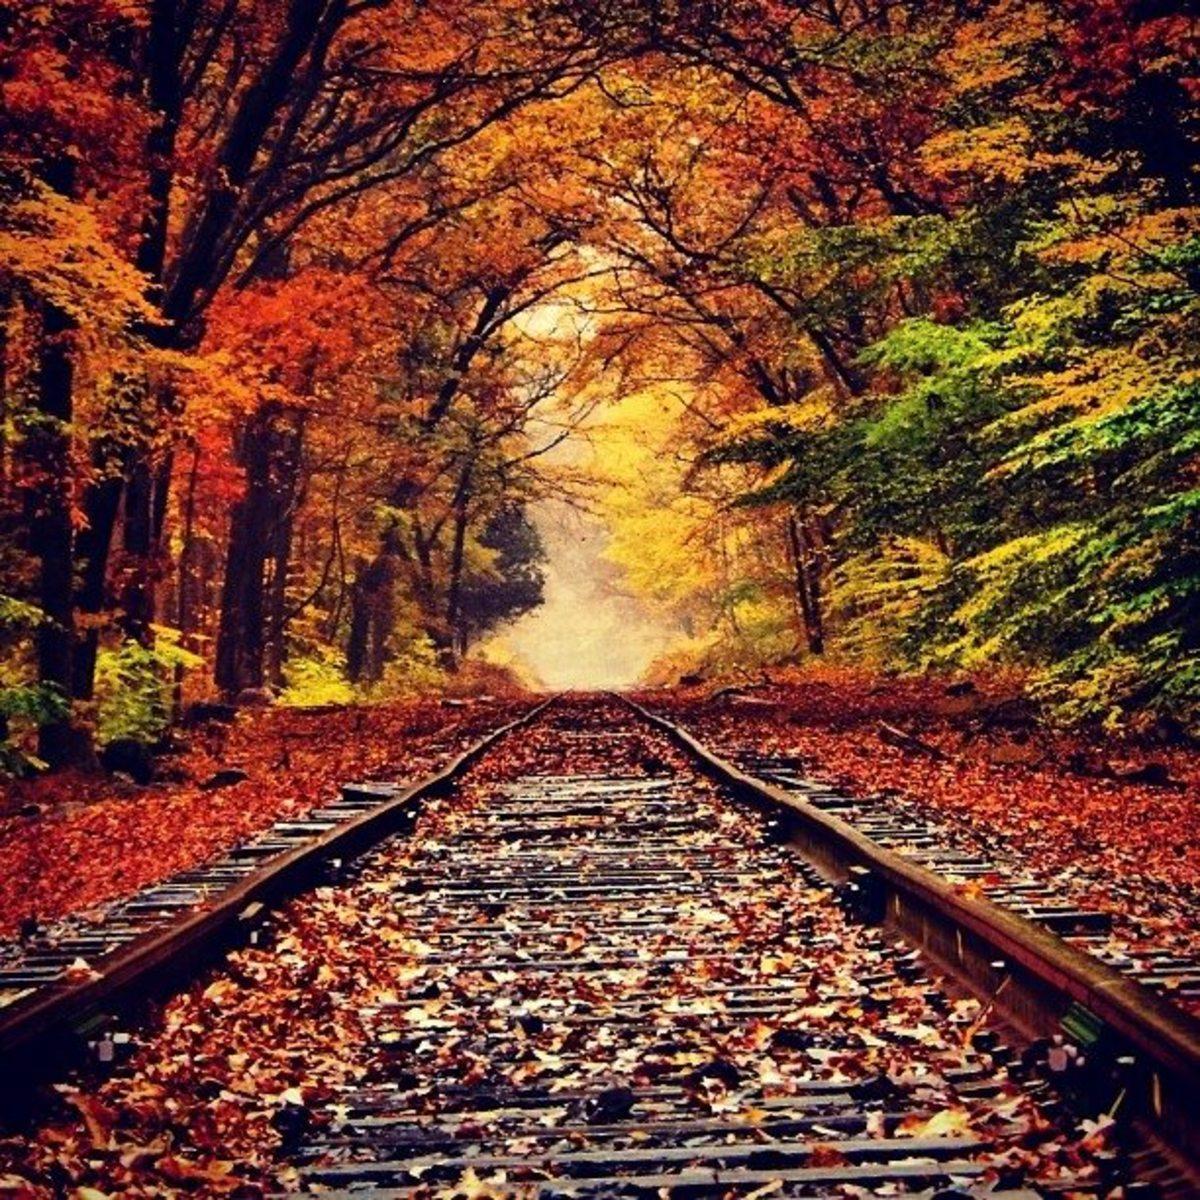 Autumn Breeze, Falling Leaves